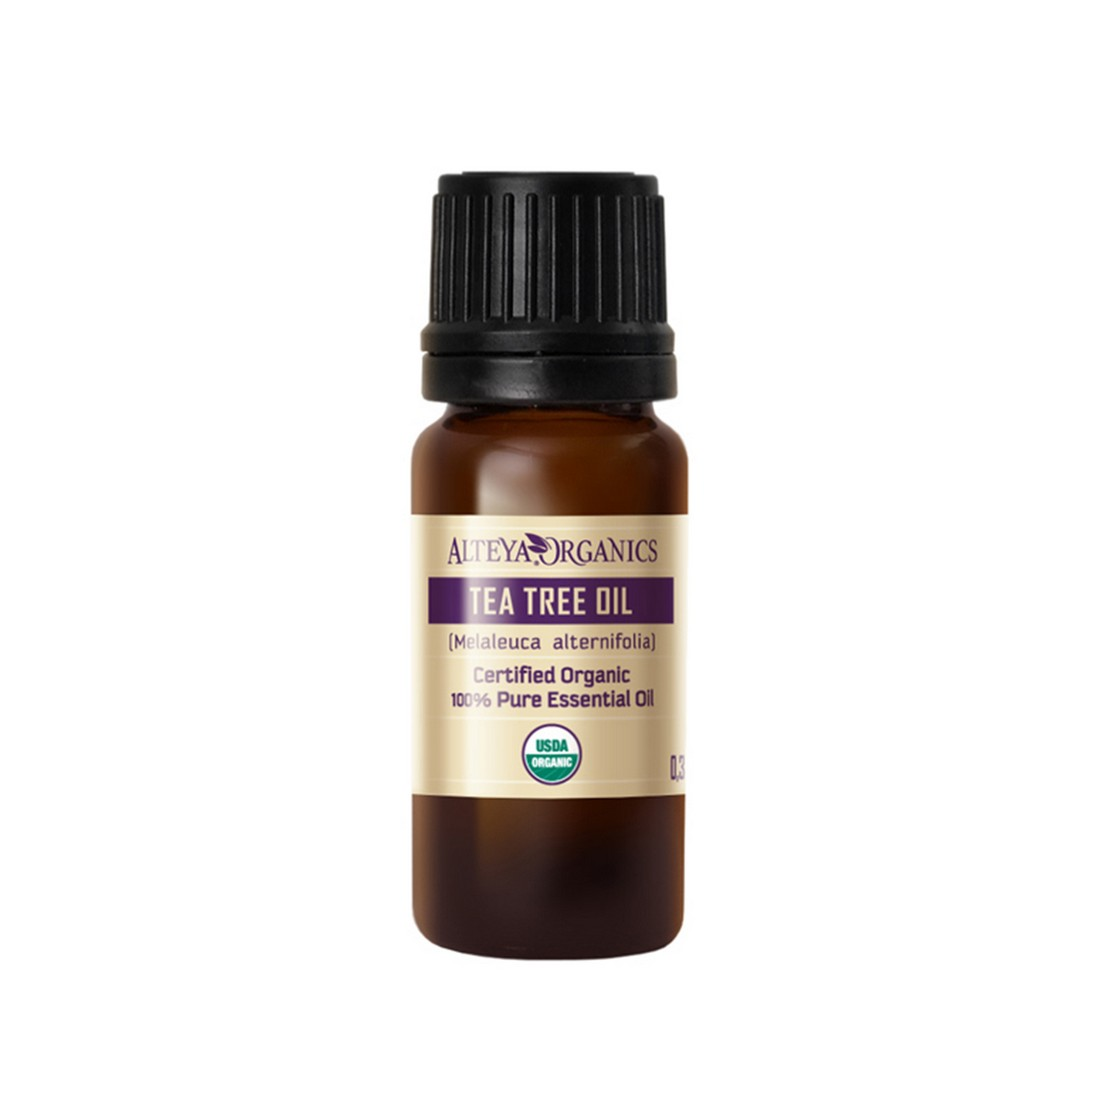 Bio organic tea trea essential oil Alteya Organics 10 ml.